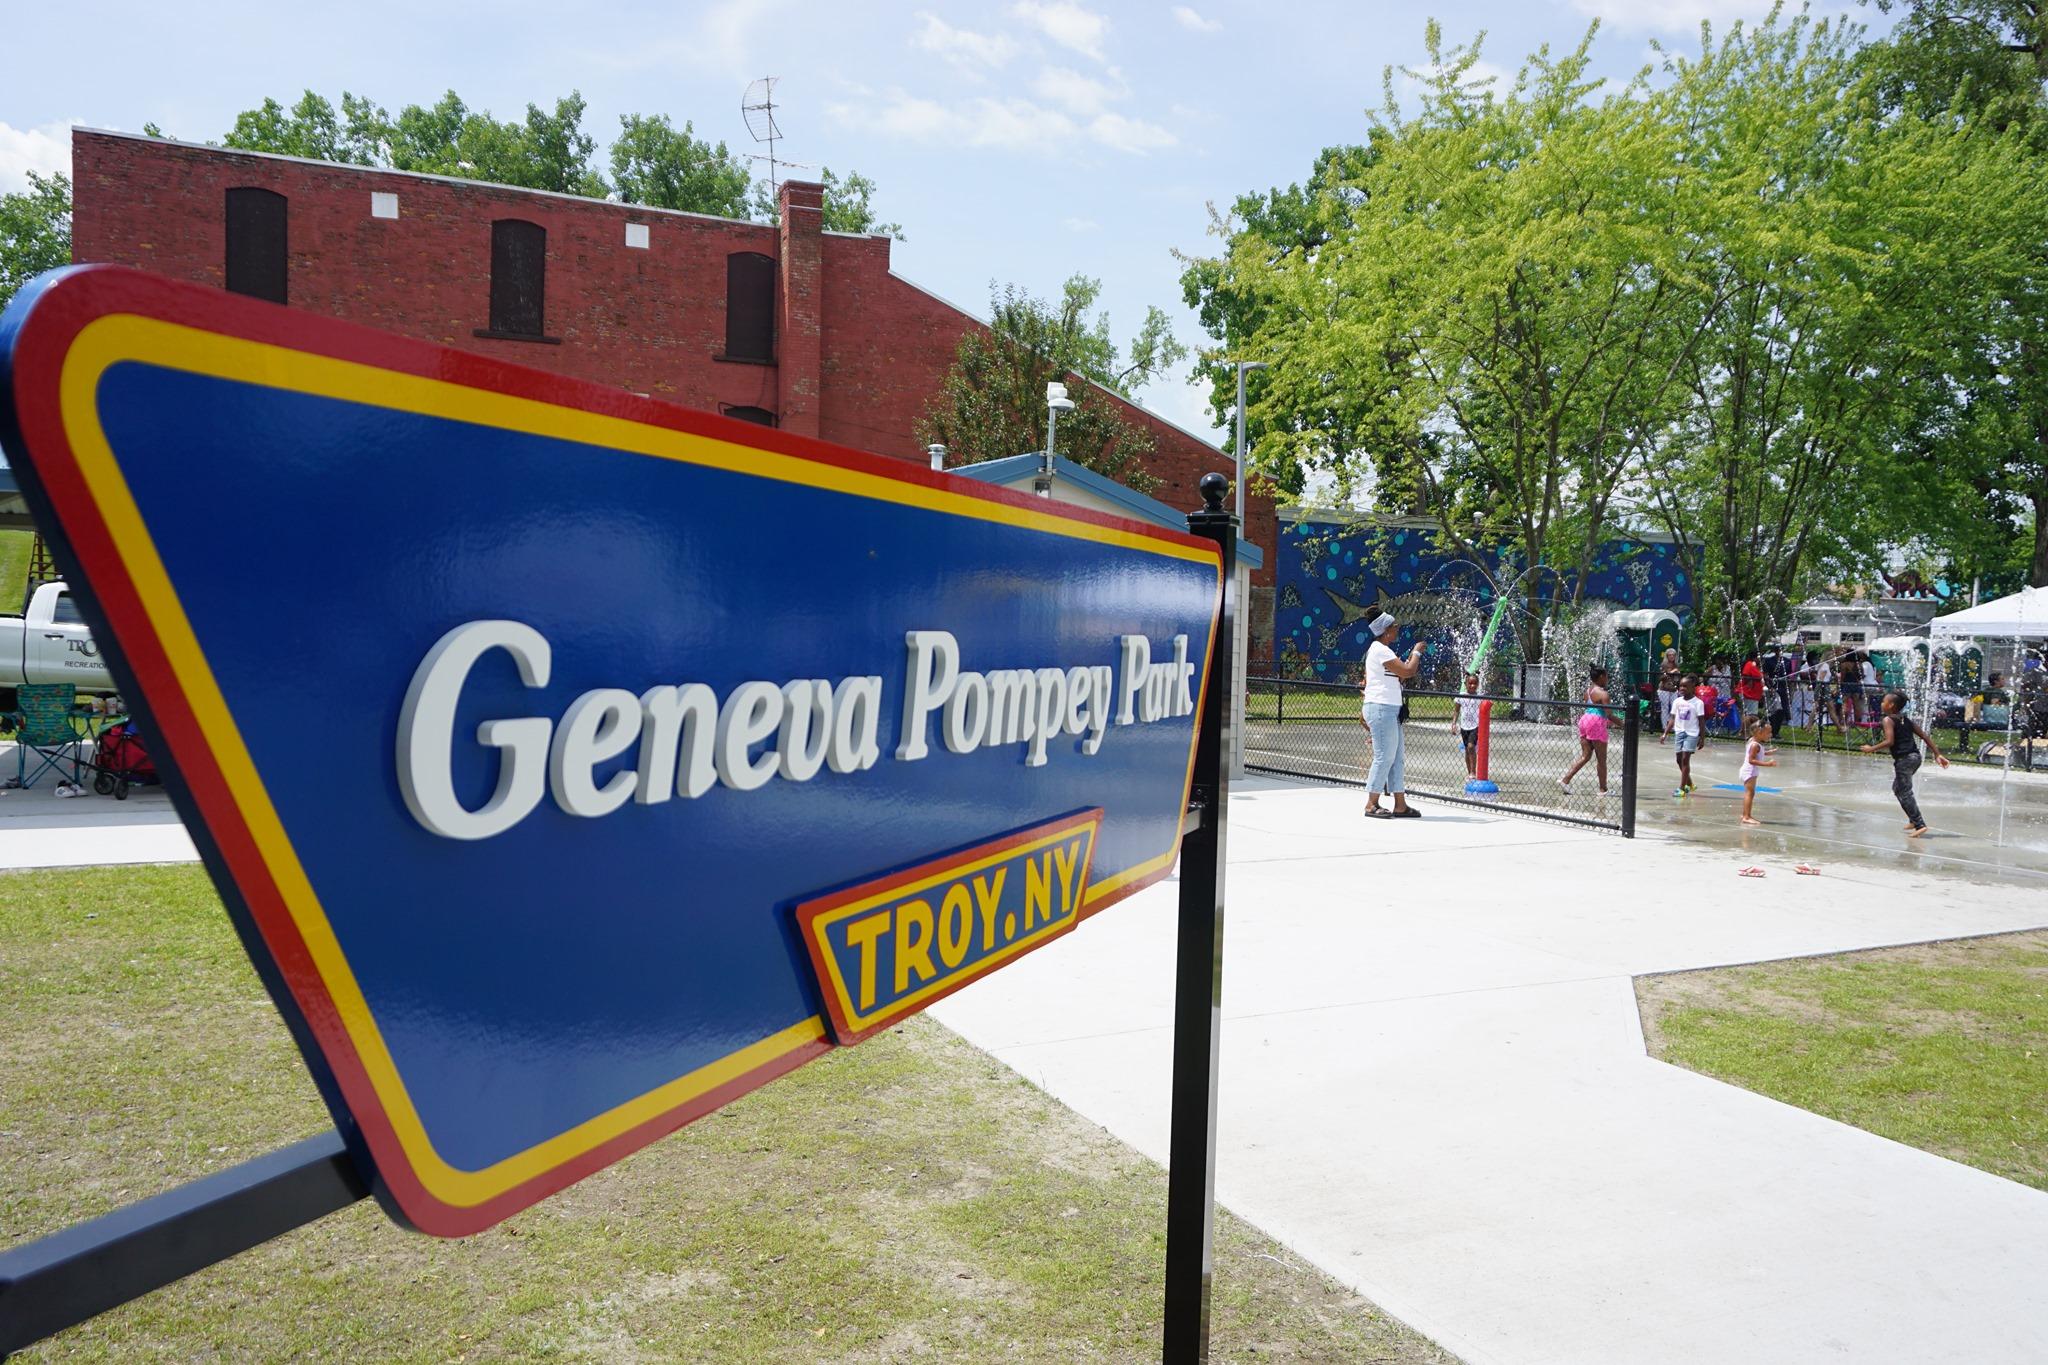 Geneva Pompey Park